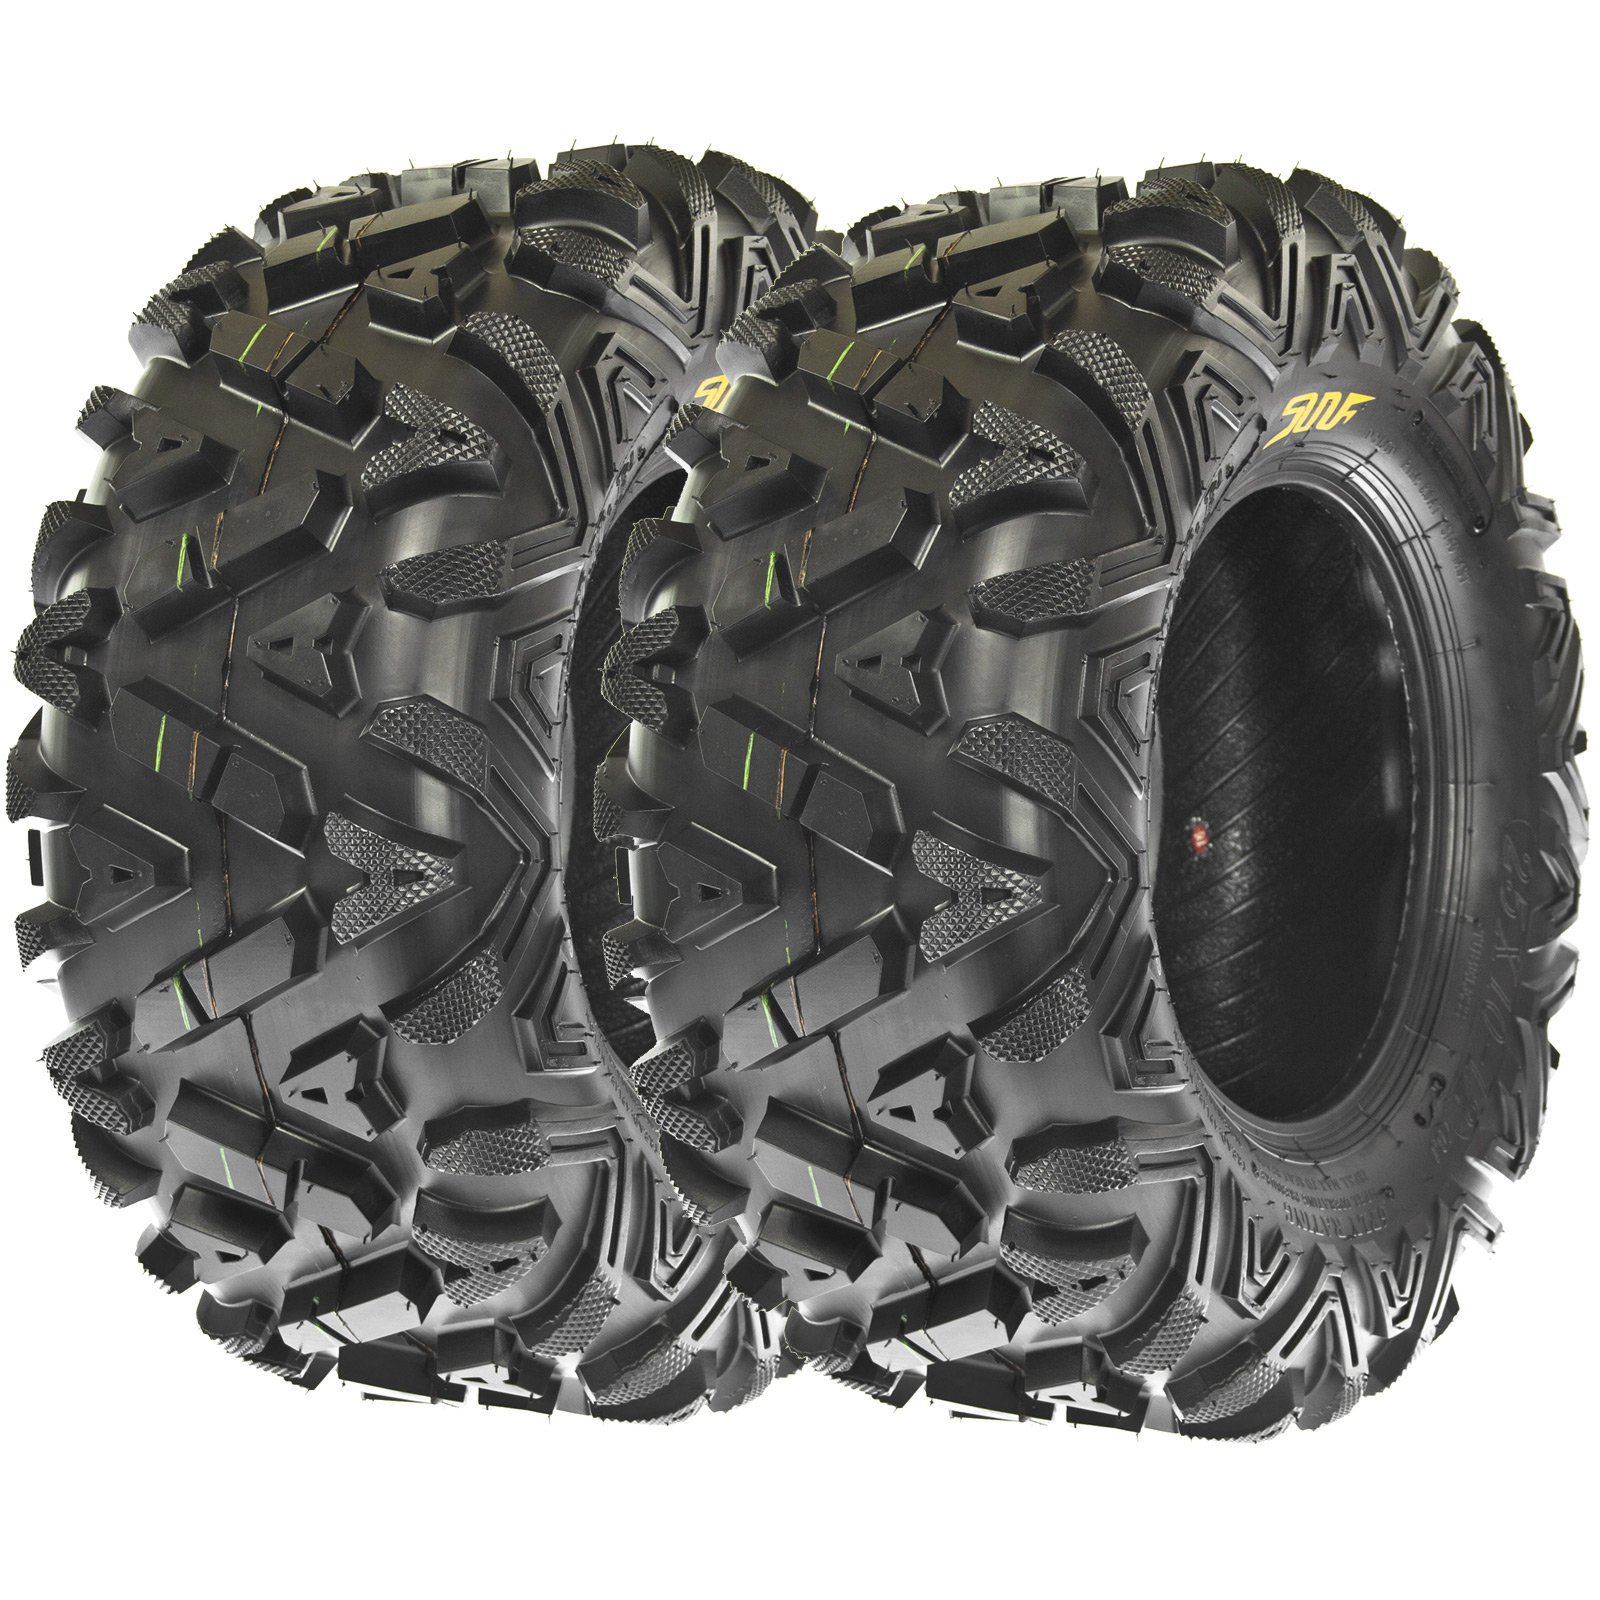 Sun.F A033 ATV Tires 24x11-10 Rear set of 2 ,6 Ply